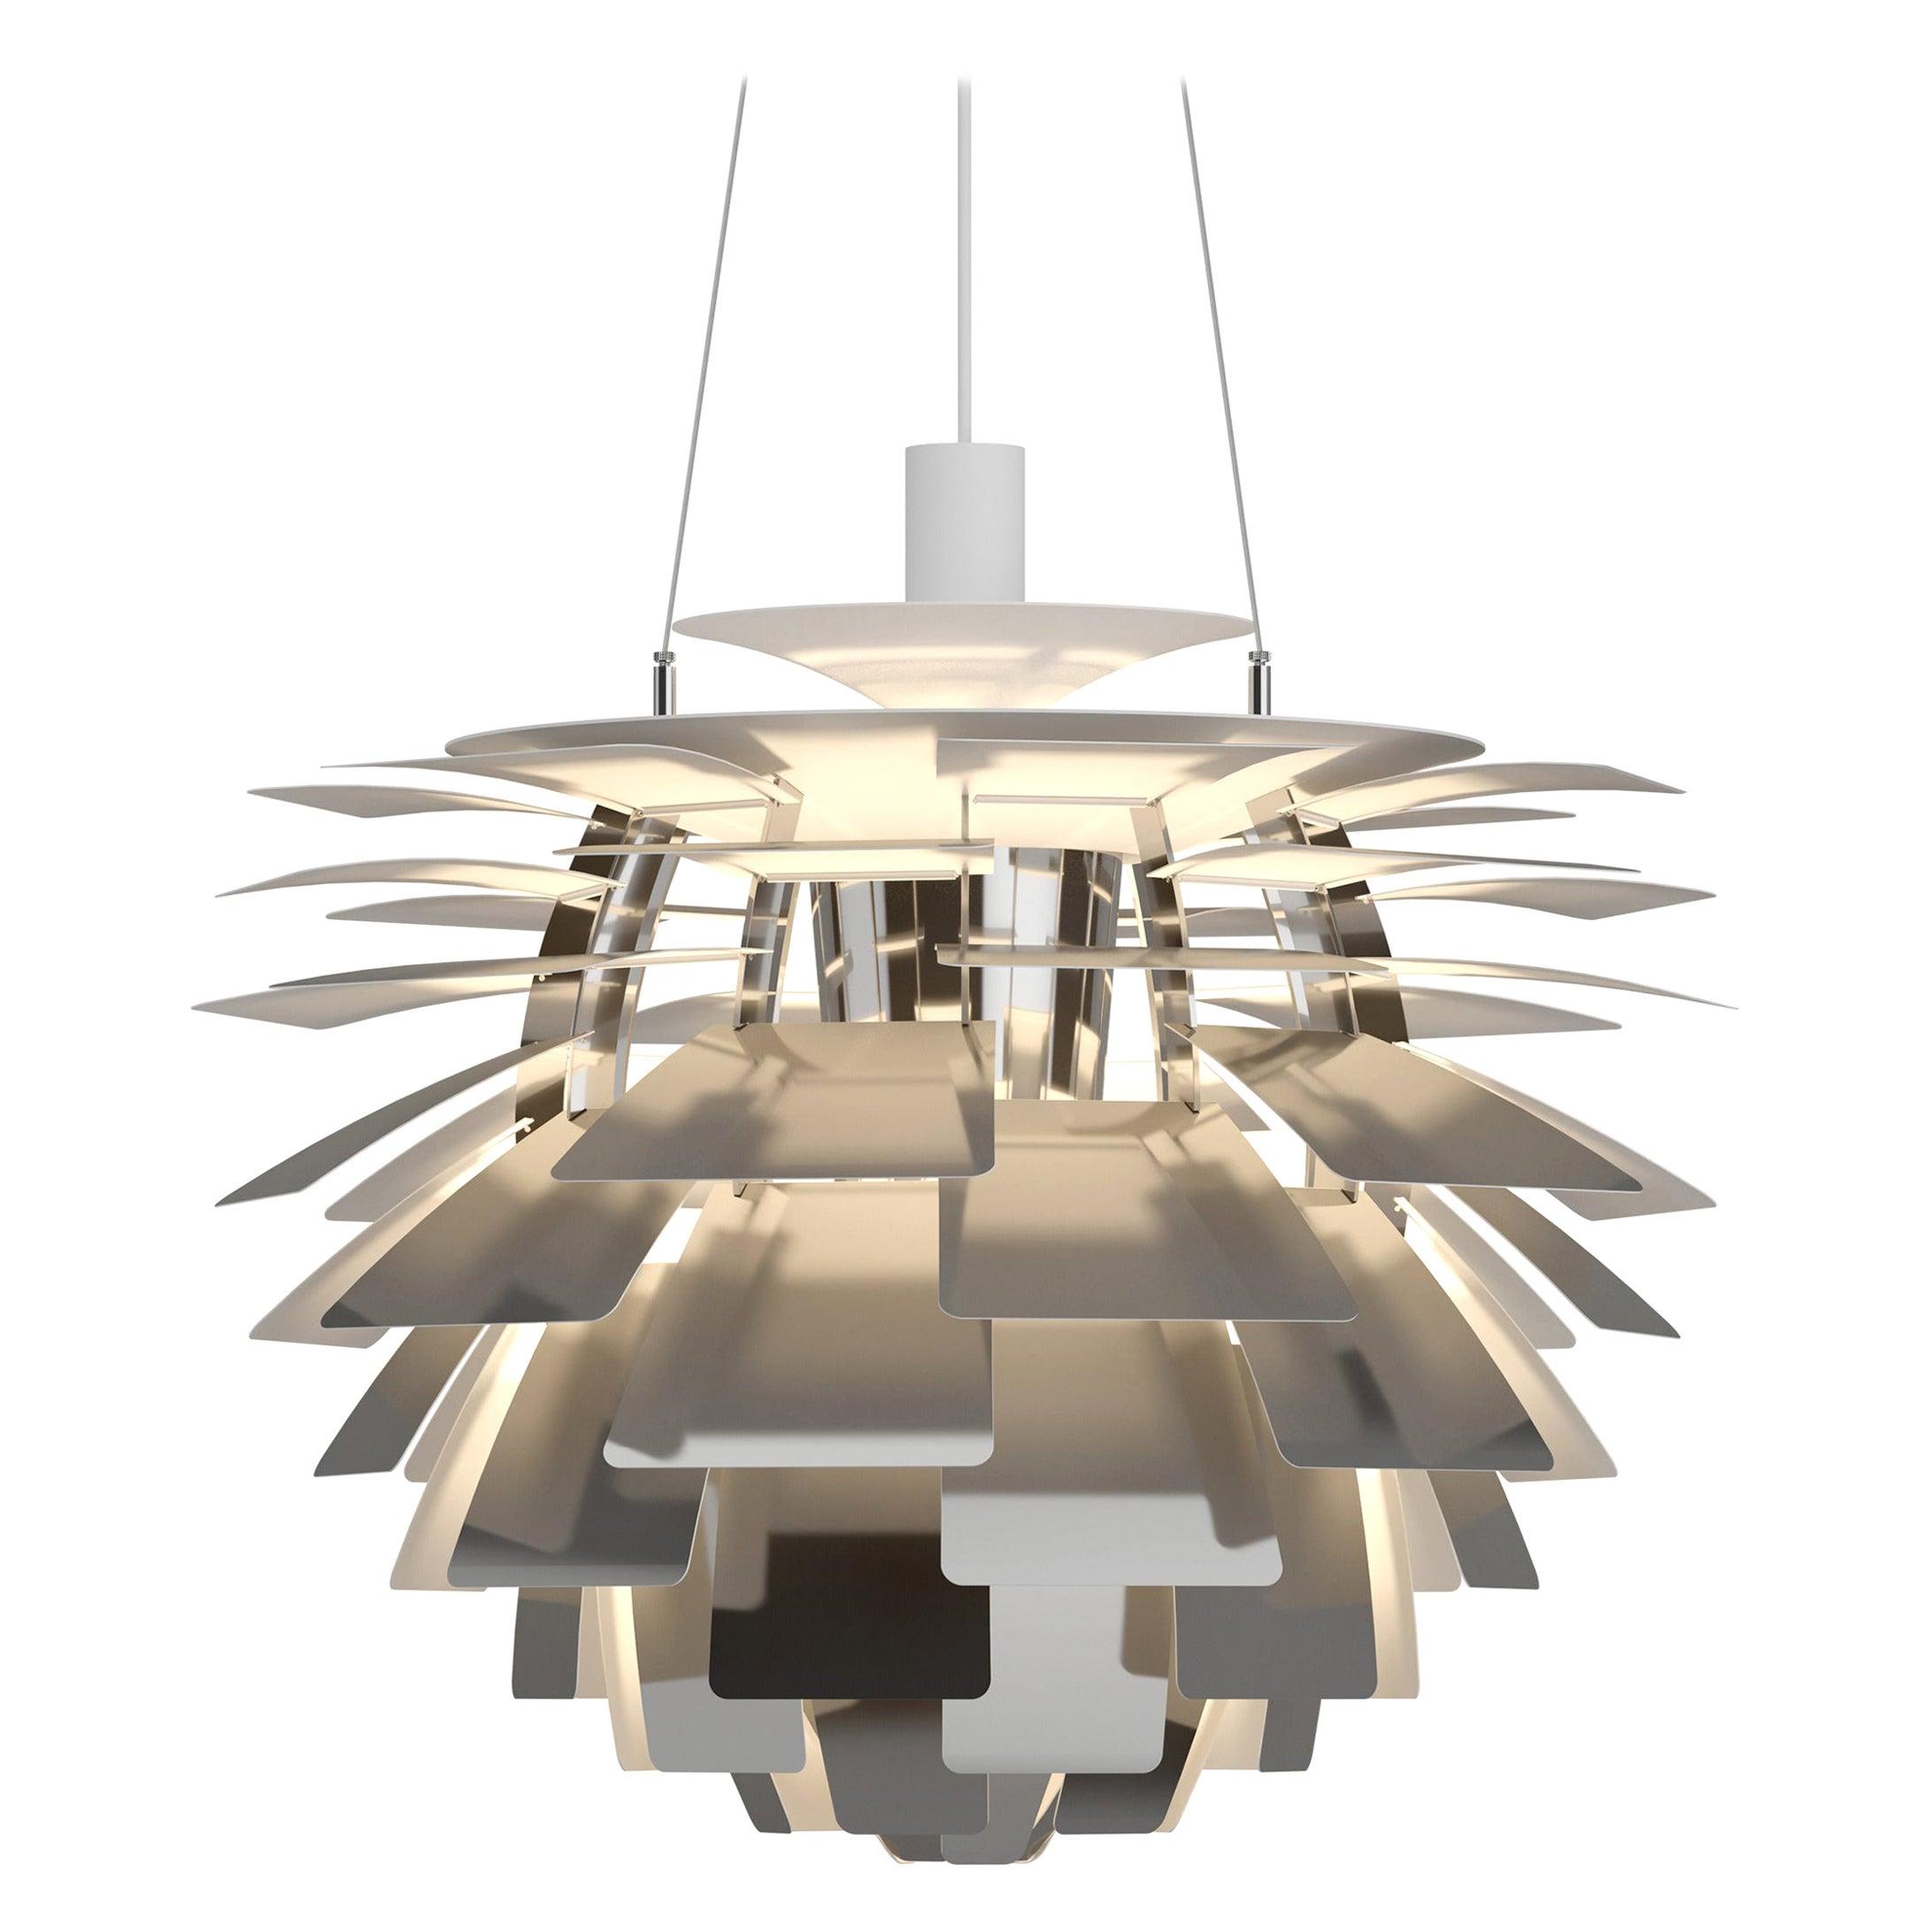 Louis Poulsen Small PH Artichoke Pendant Light by Poul Henningsen